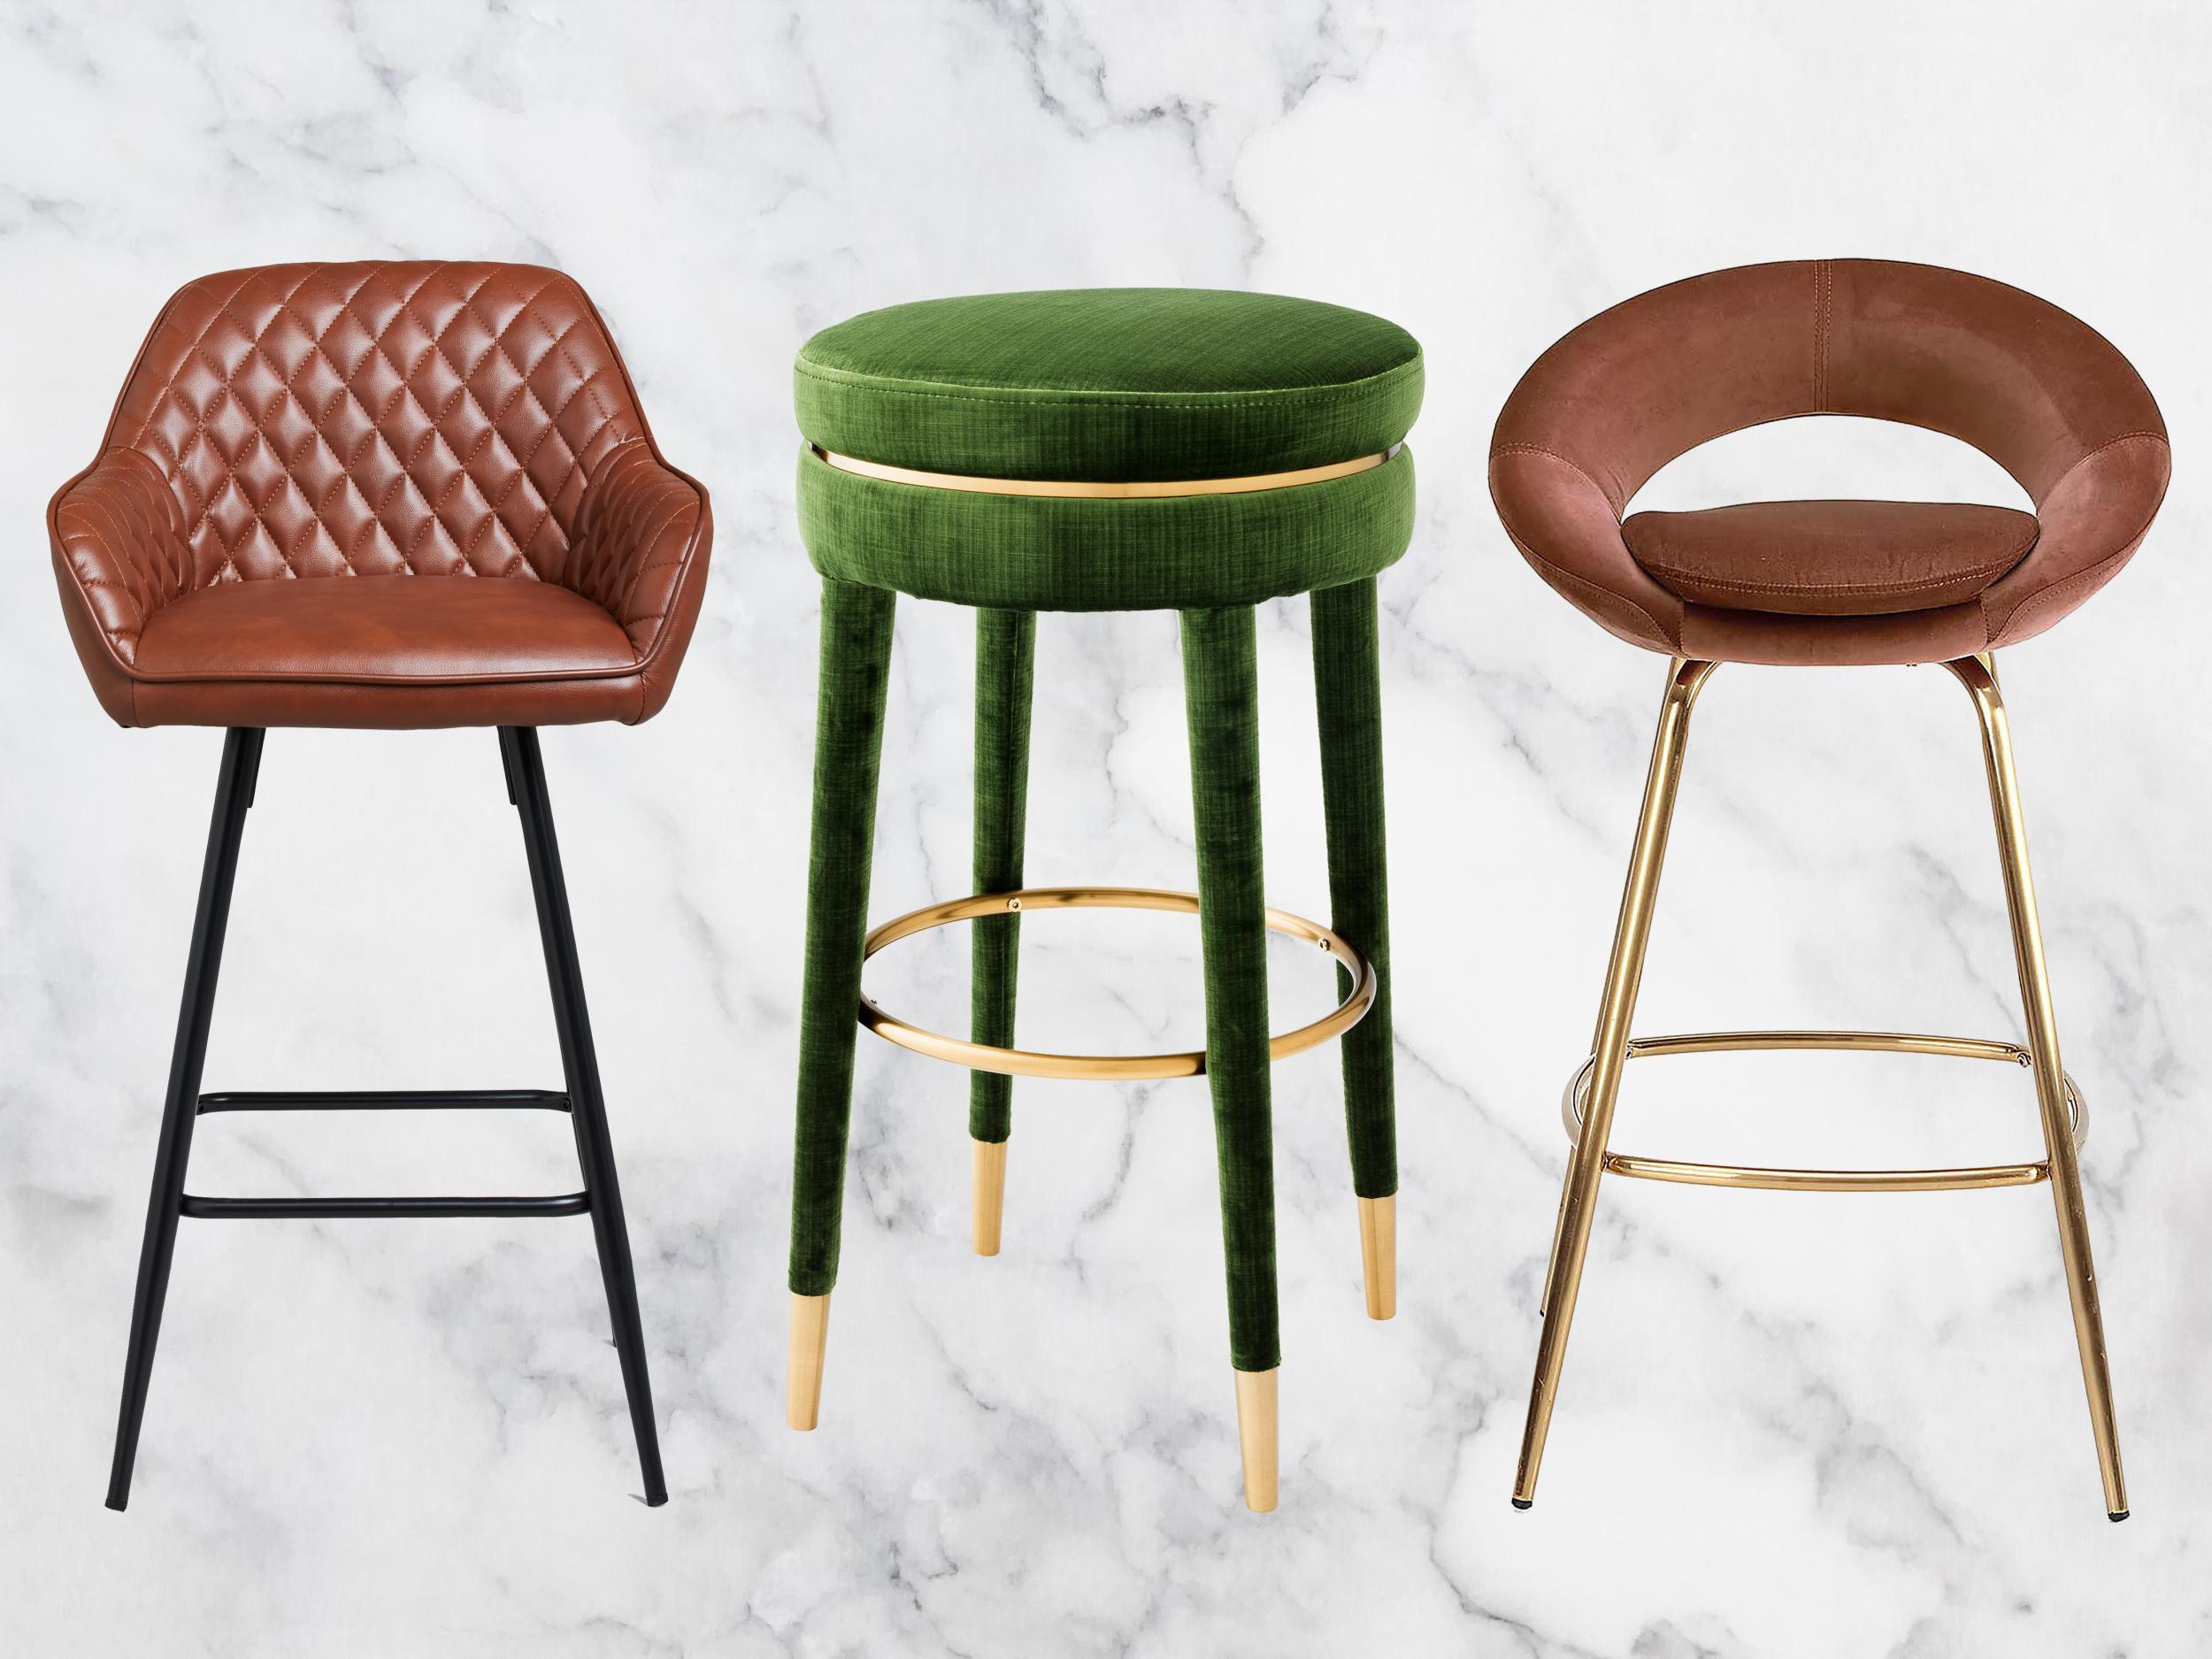 Stühle Round Folding Bar Stool Breakfast Padded High Chair Seat ...